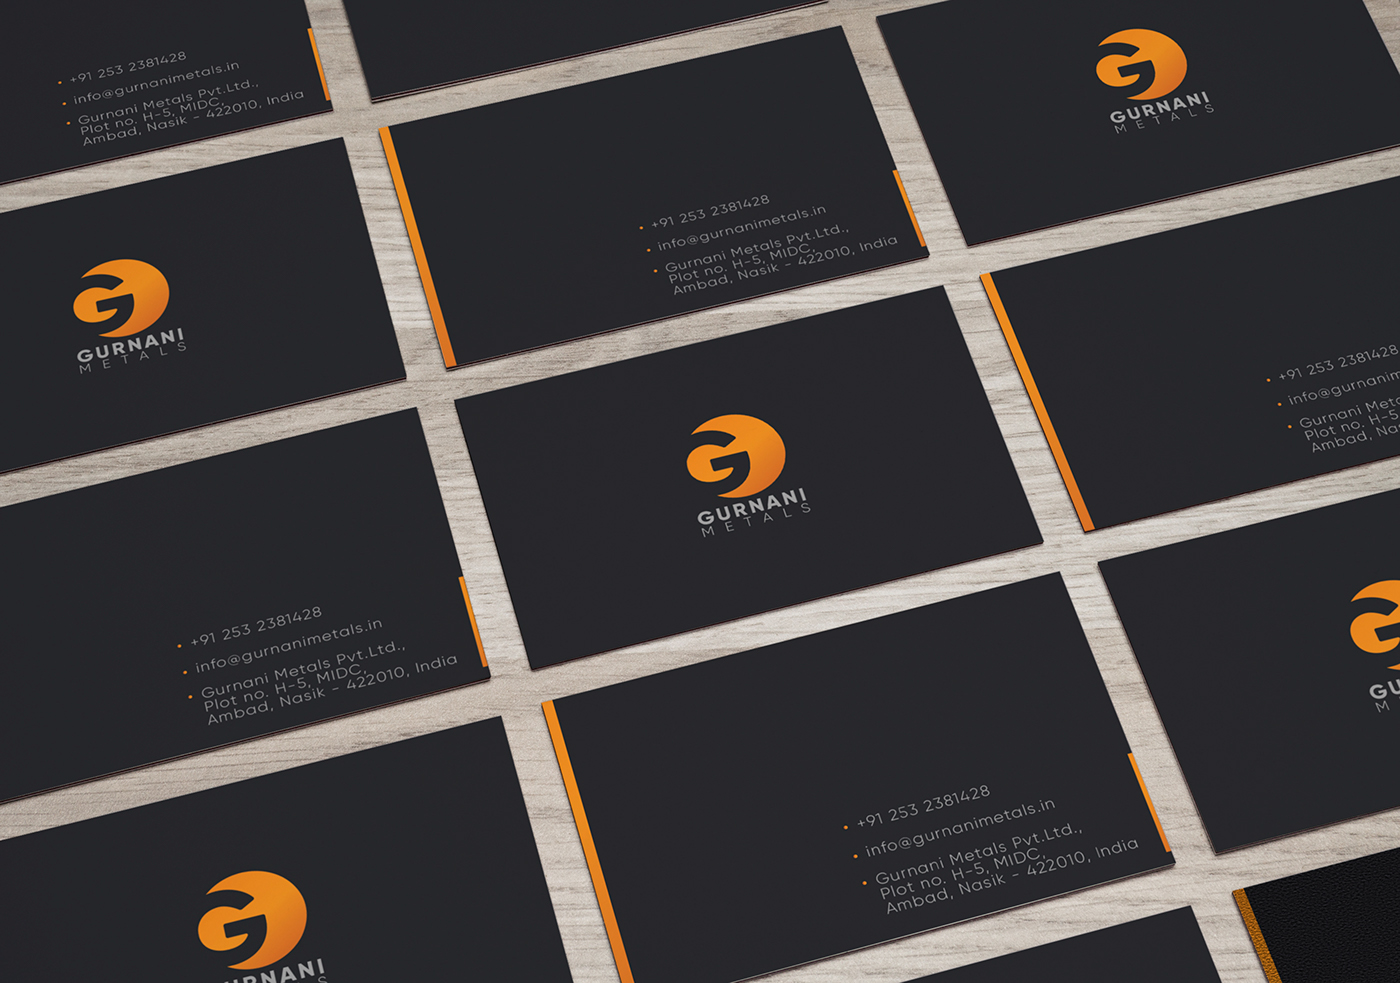 Gurnani Metals,metals,branding ,Engineering branding,black,business card,Stationery,Startup Farms